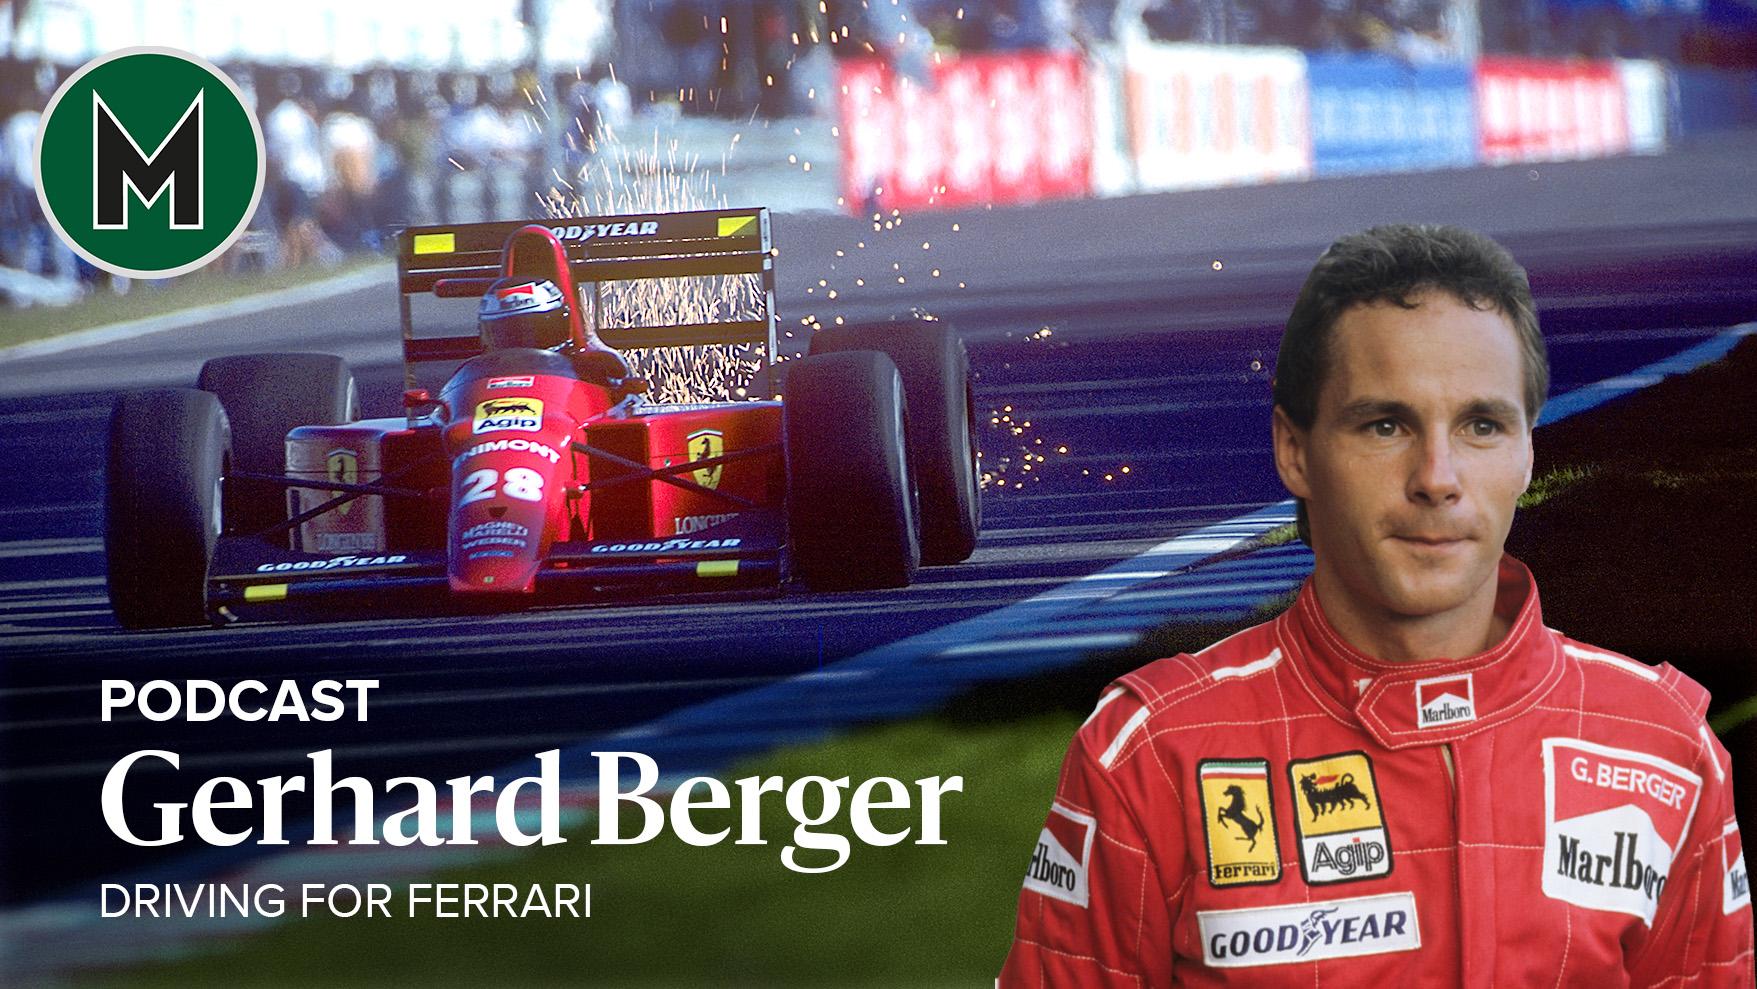 Gerhard Berger Ferrari podcast